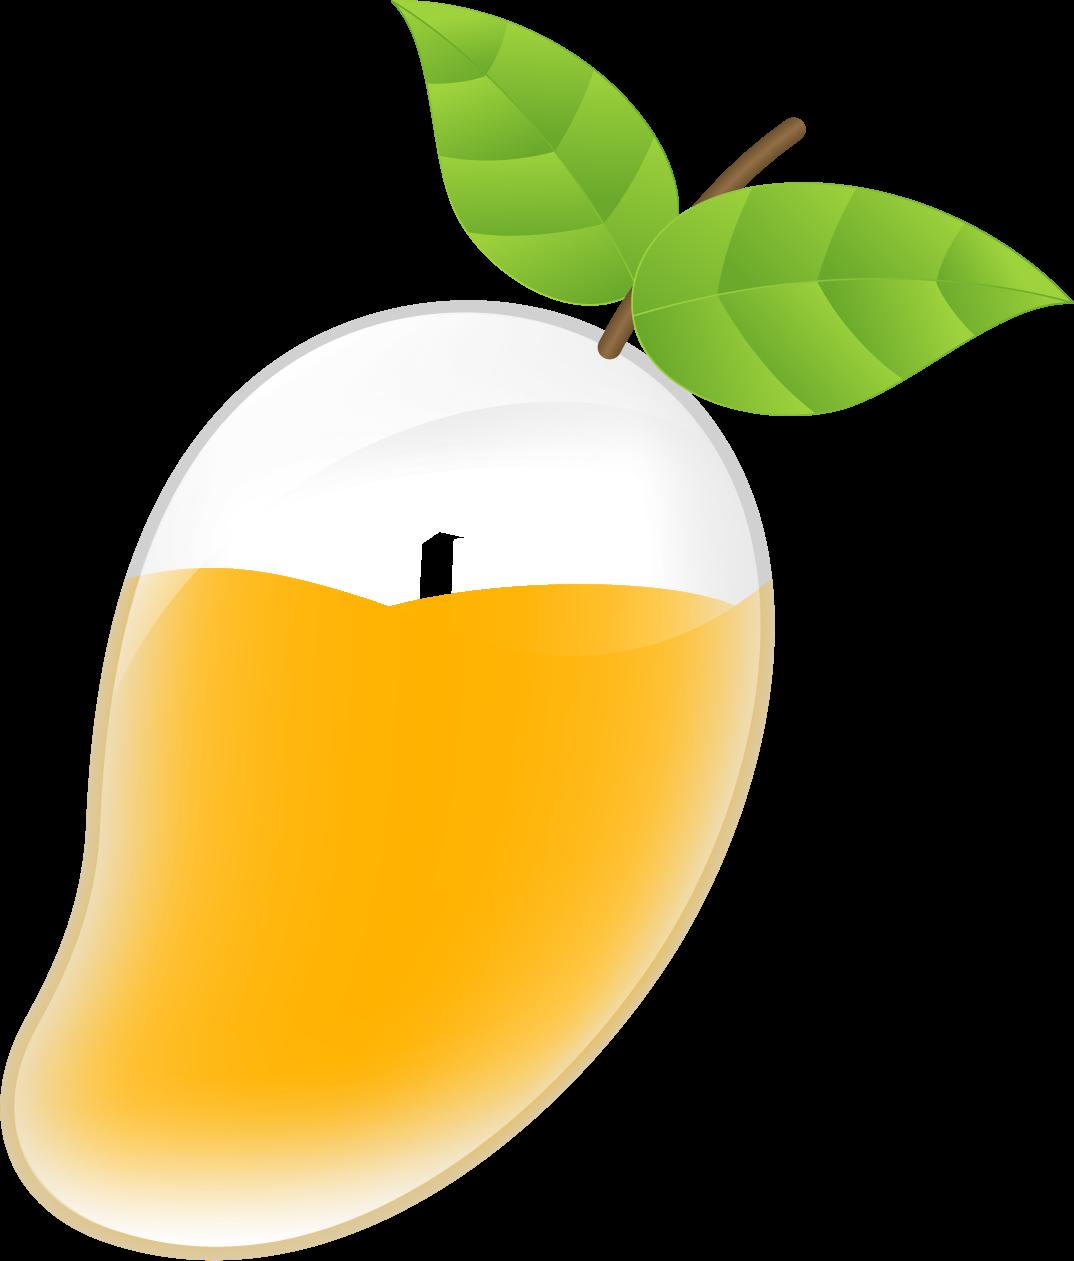 Png transparent free images. Mango clipart cherry